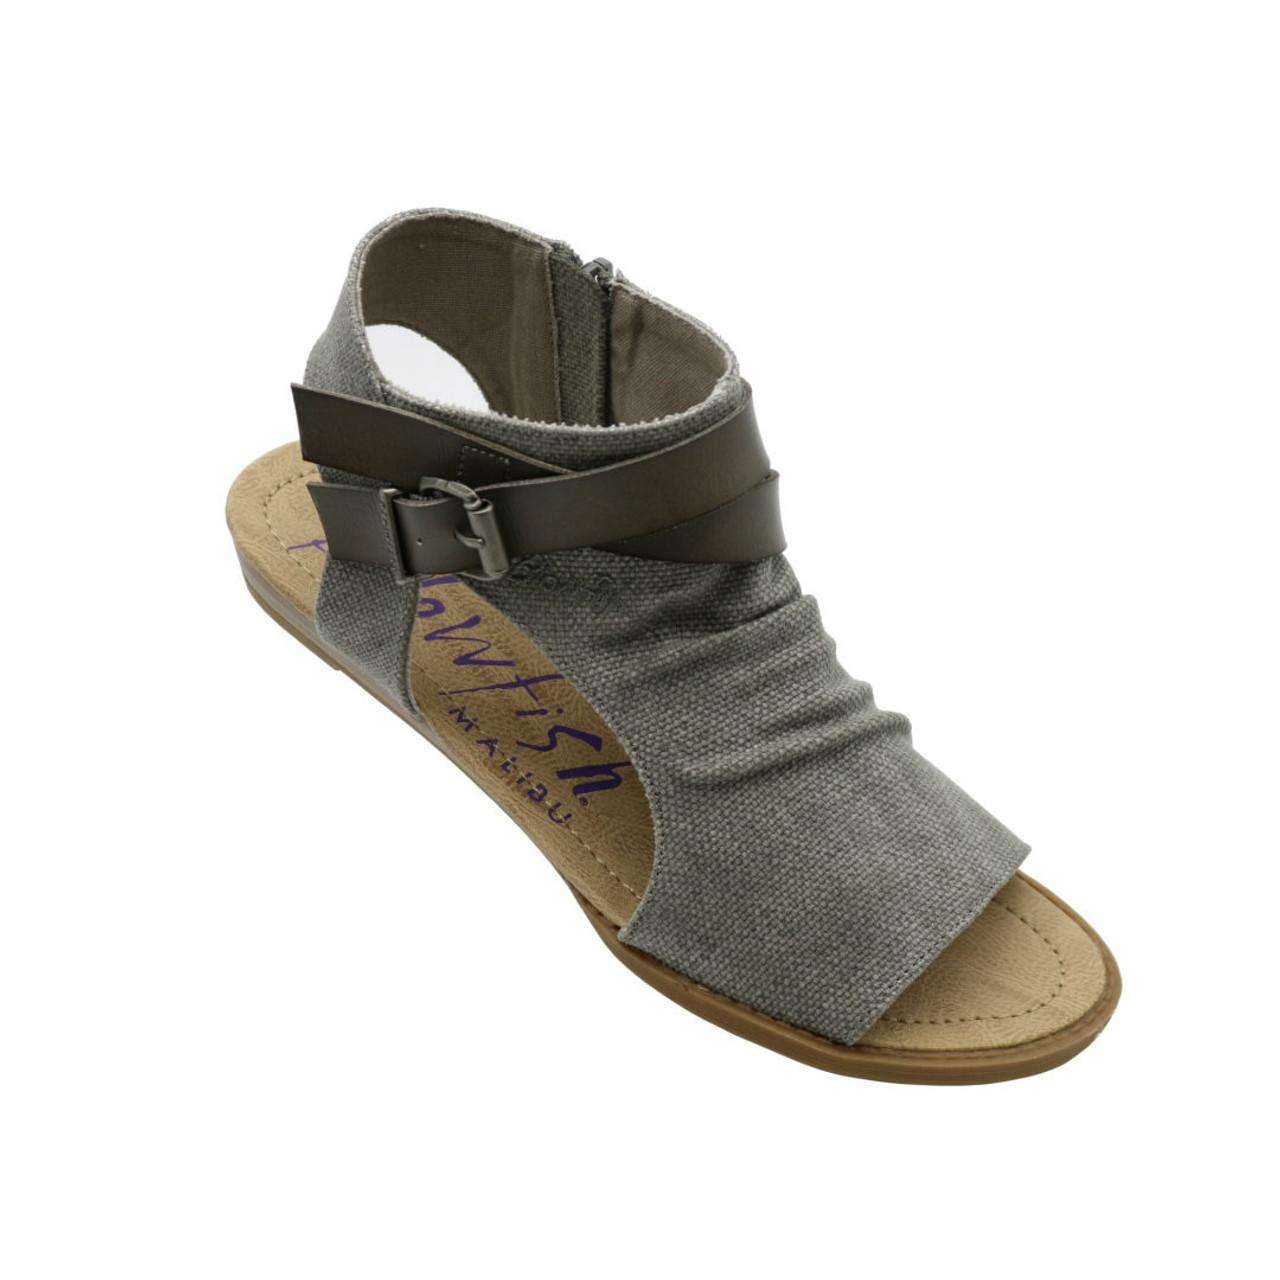 5a1ce472e71 Balla Sandal by Blowfish - Steel Grey - Trendy Threads Inc